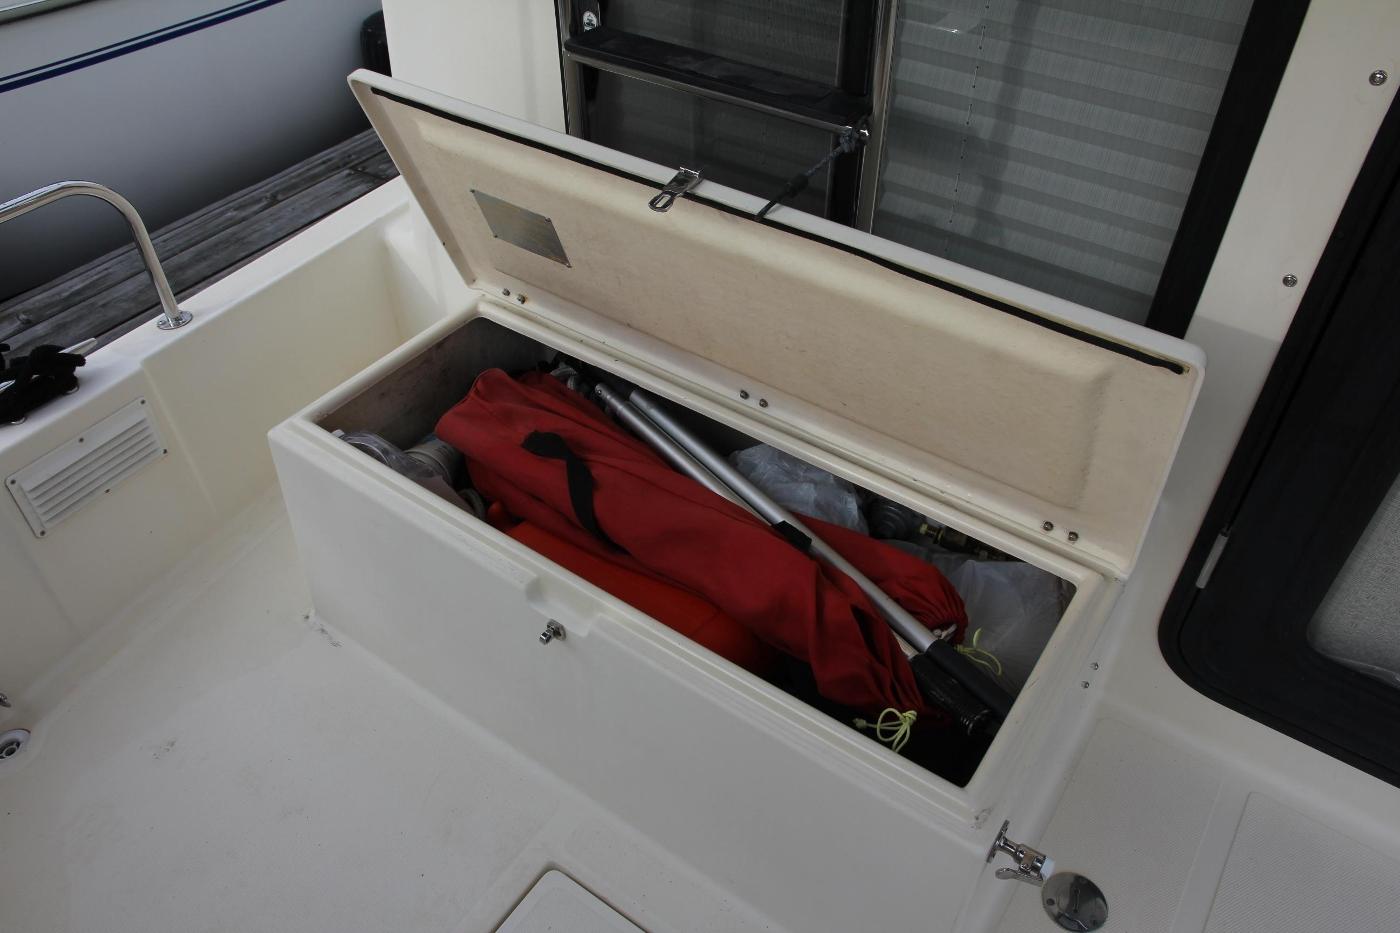 2001 Nordic Tugs 32 Pilothouse, Cockpit Storage Locker